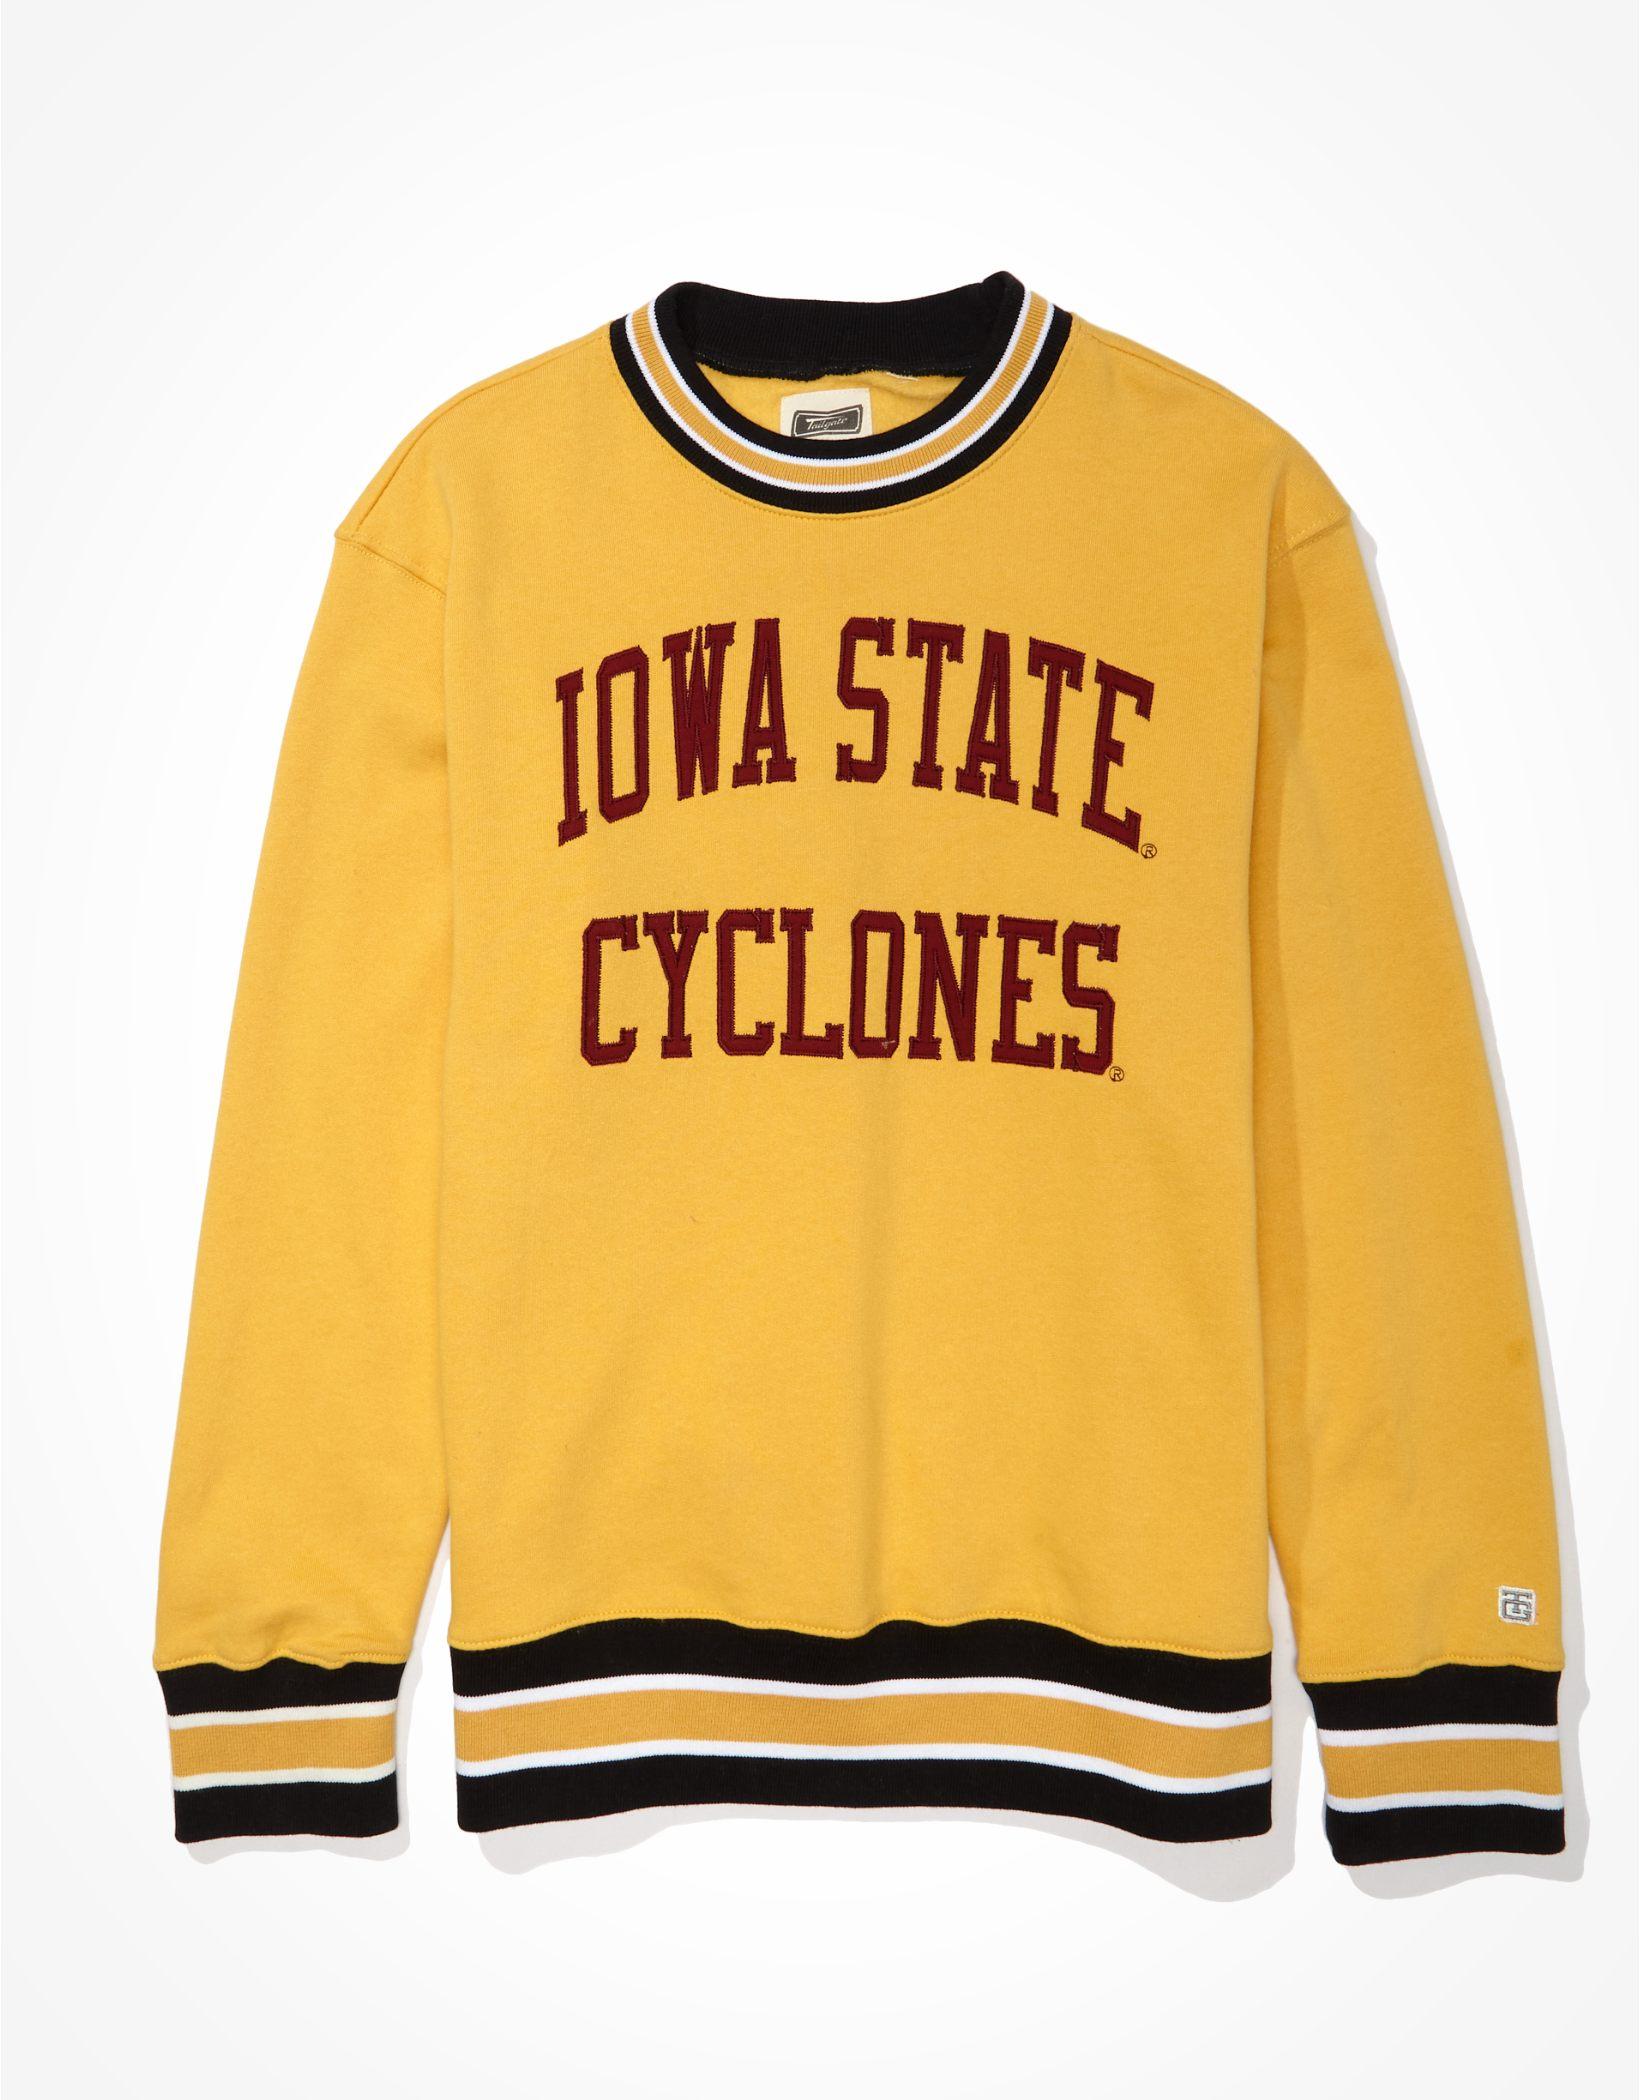 Tailgate Men's Iowa State Cyclones Tipped Fleece Sweatshirt